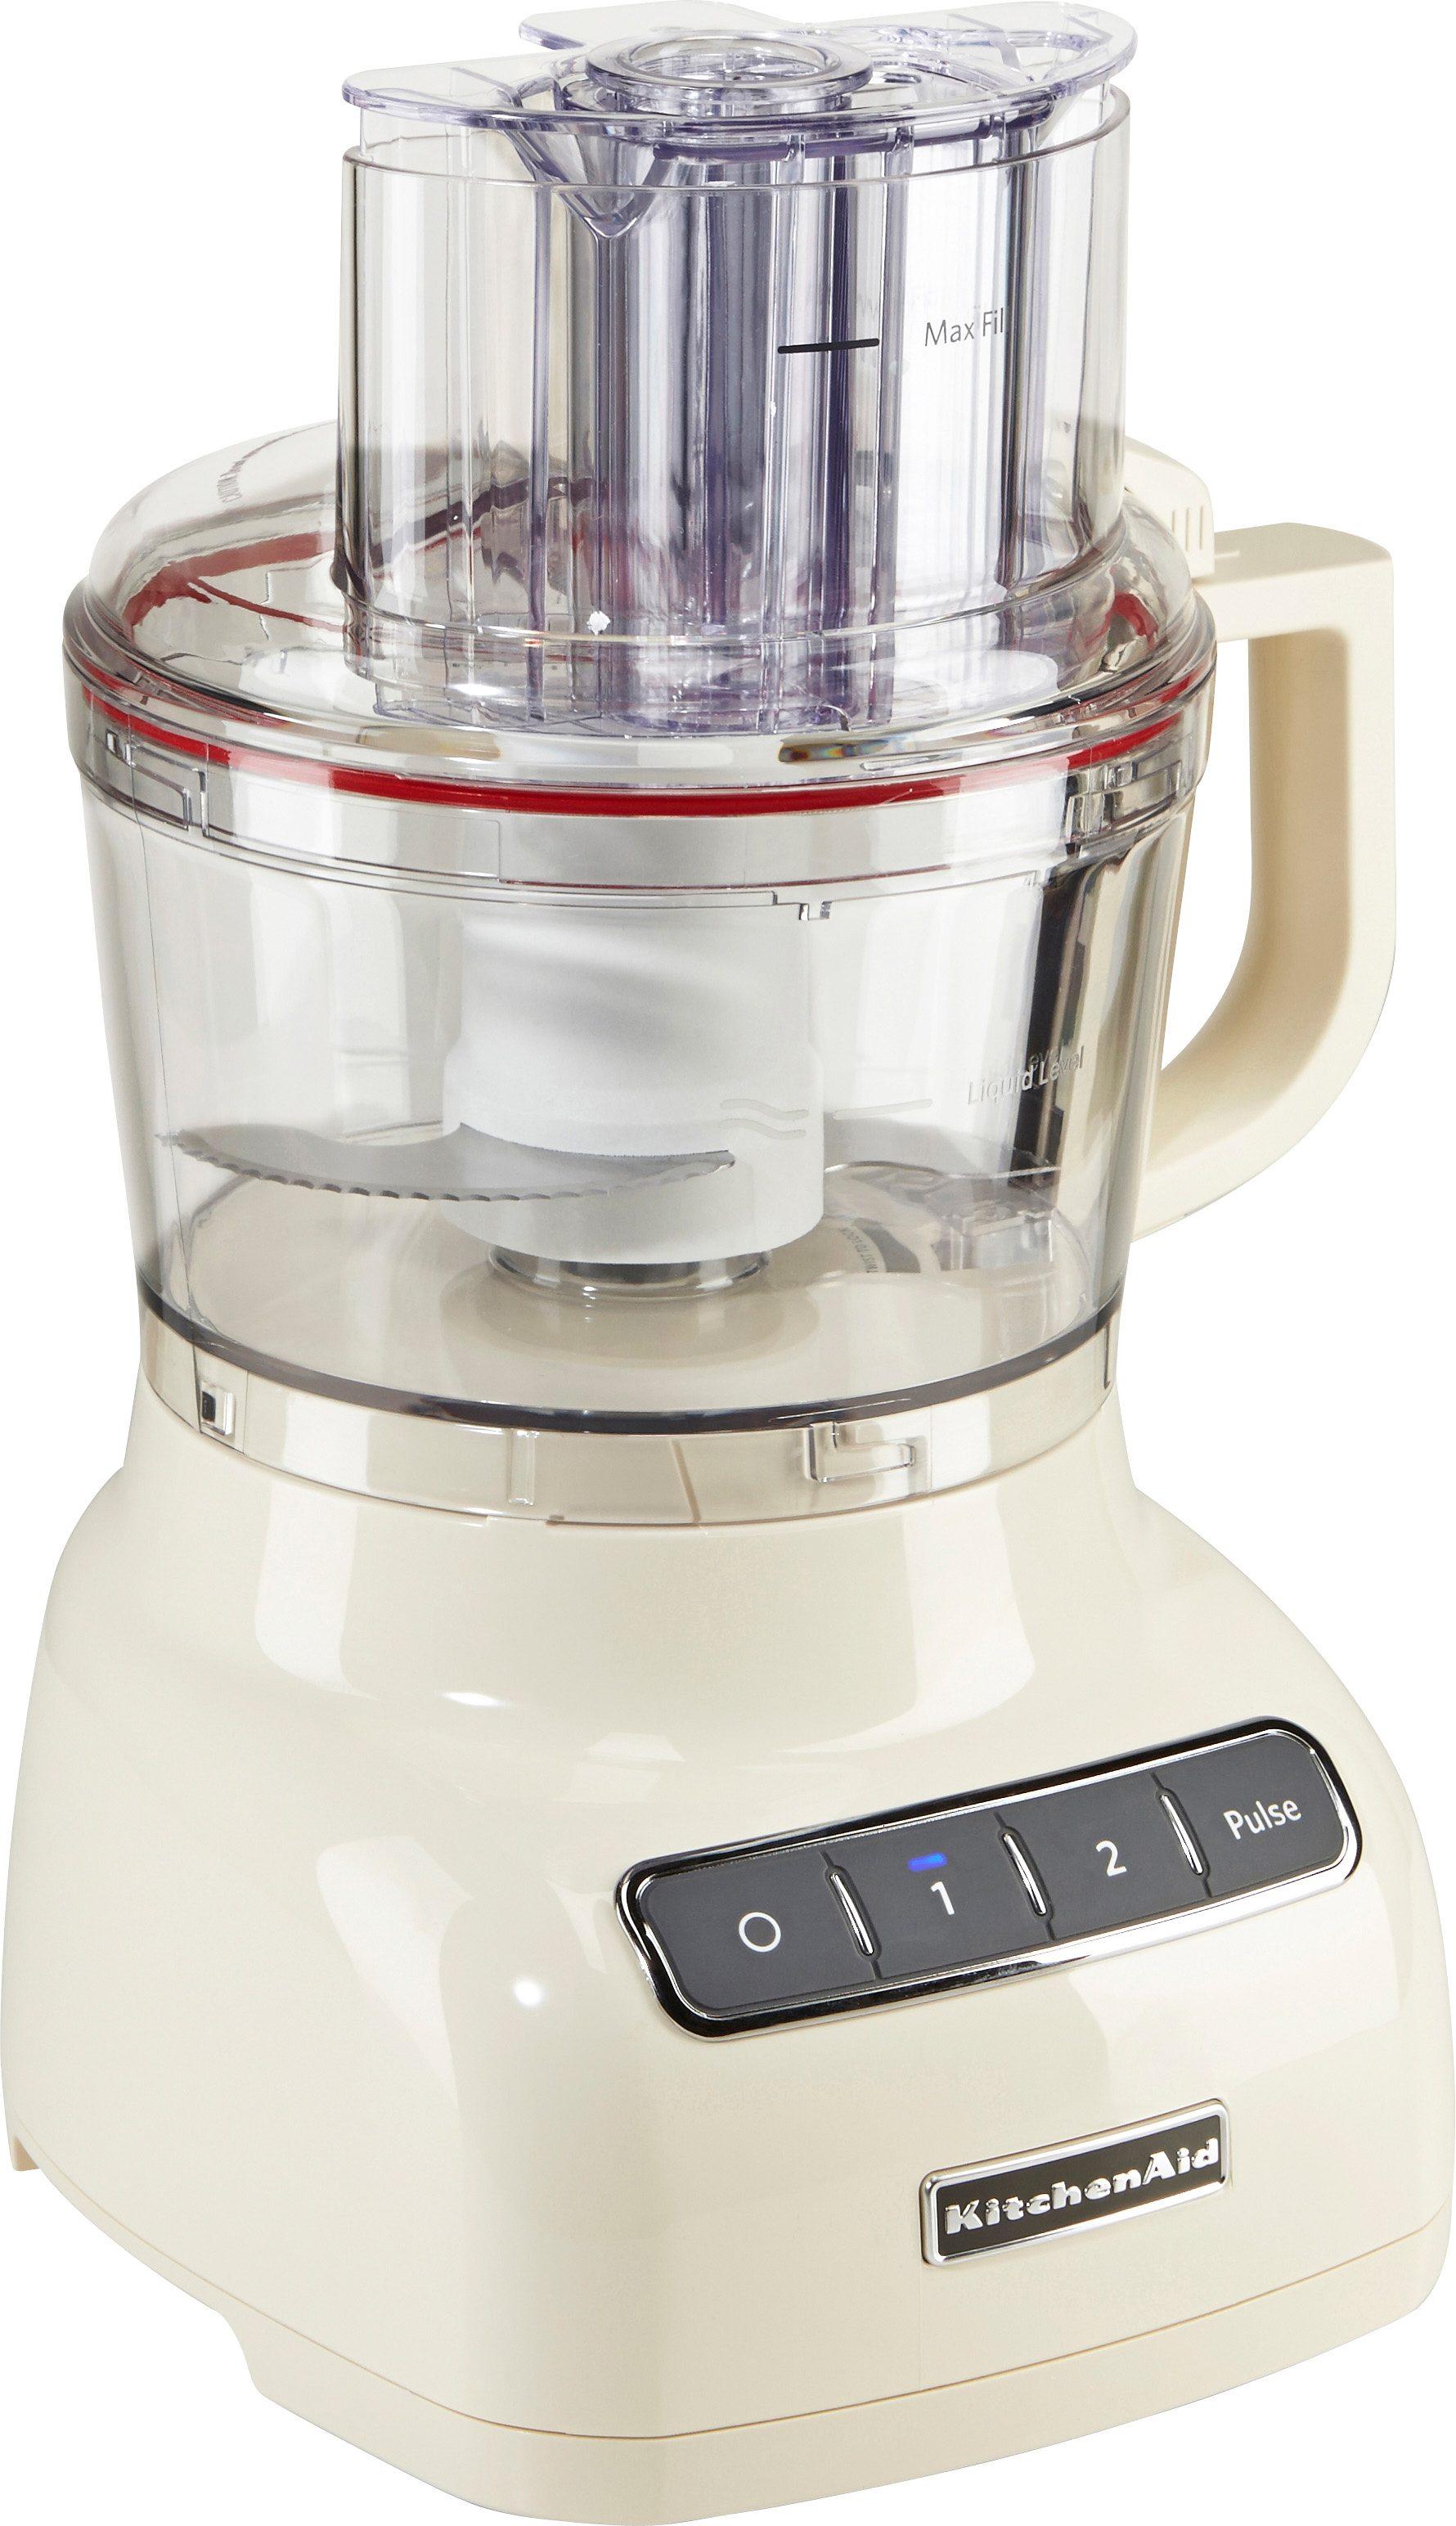 KitchenAid Artisan Food Processor 5KFP0925EAC, 2,1 Liter, créme